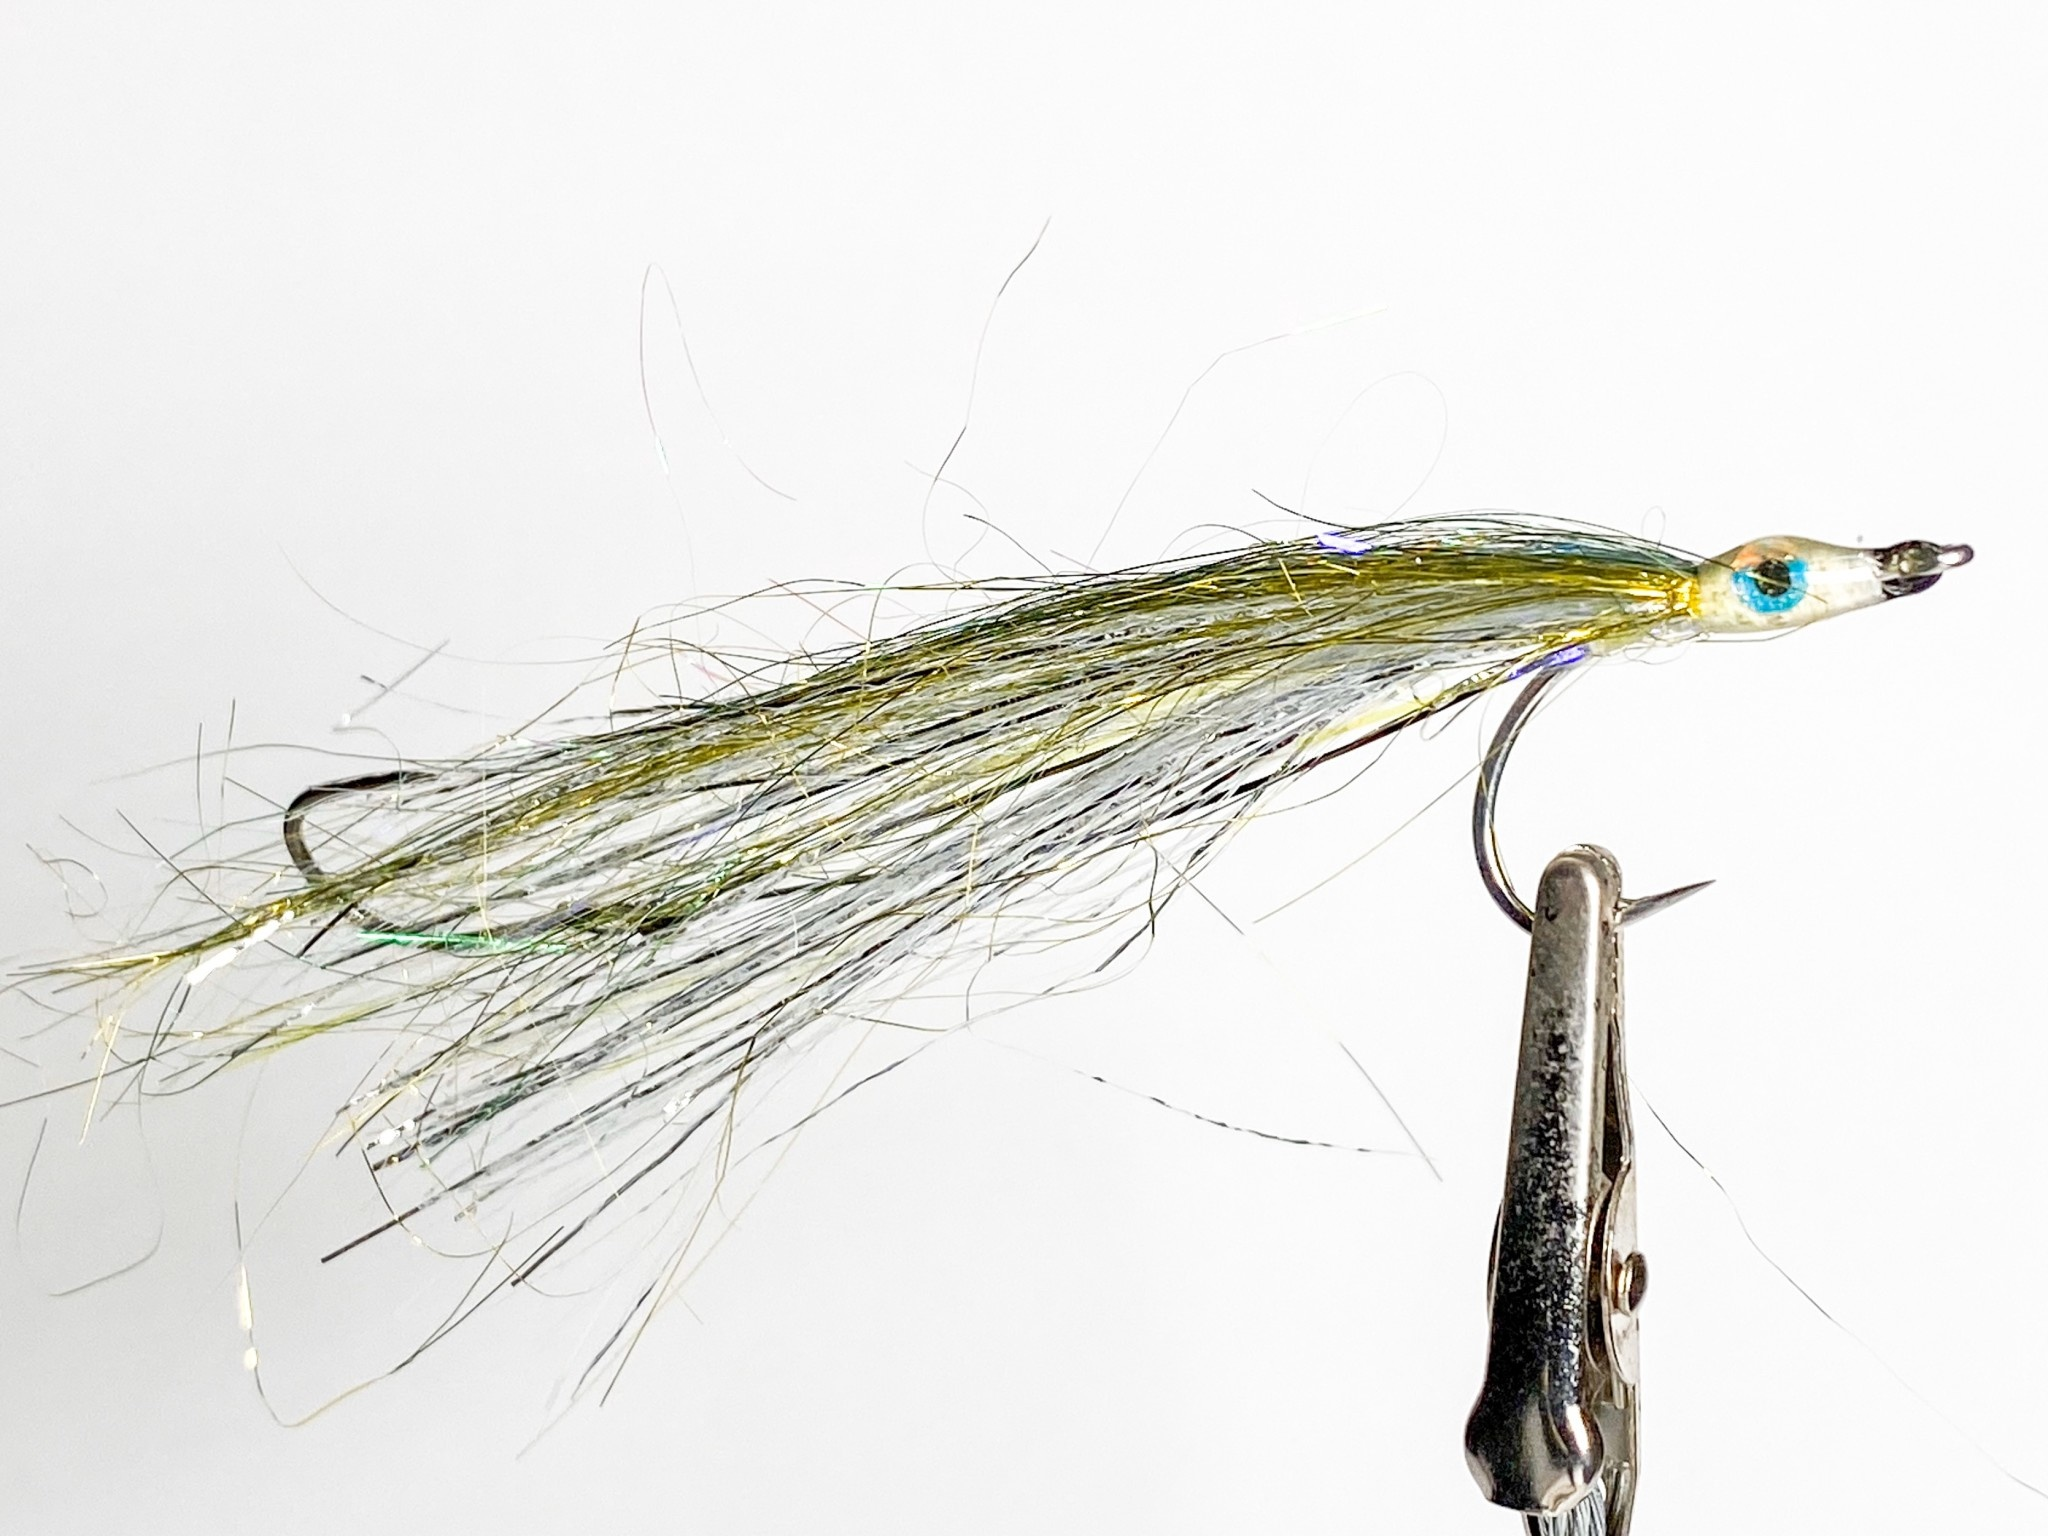 Gig Harbor Fly Shop Salmon Bucktail Size 2 w/ size 4 stinger